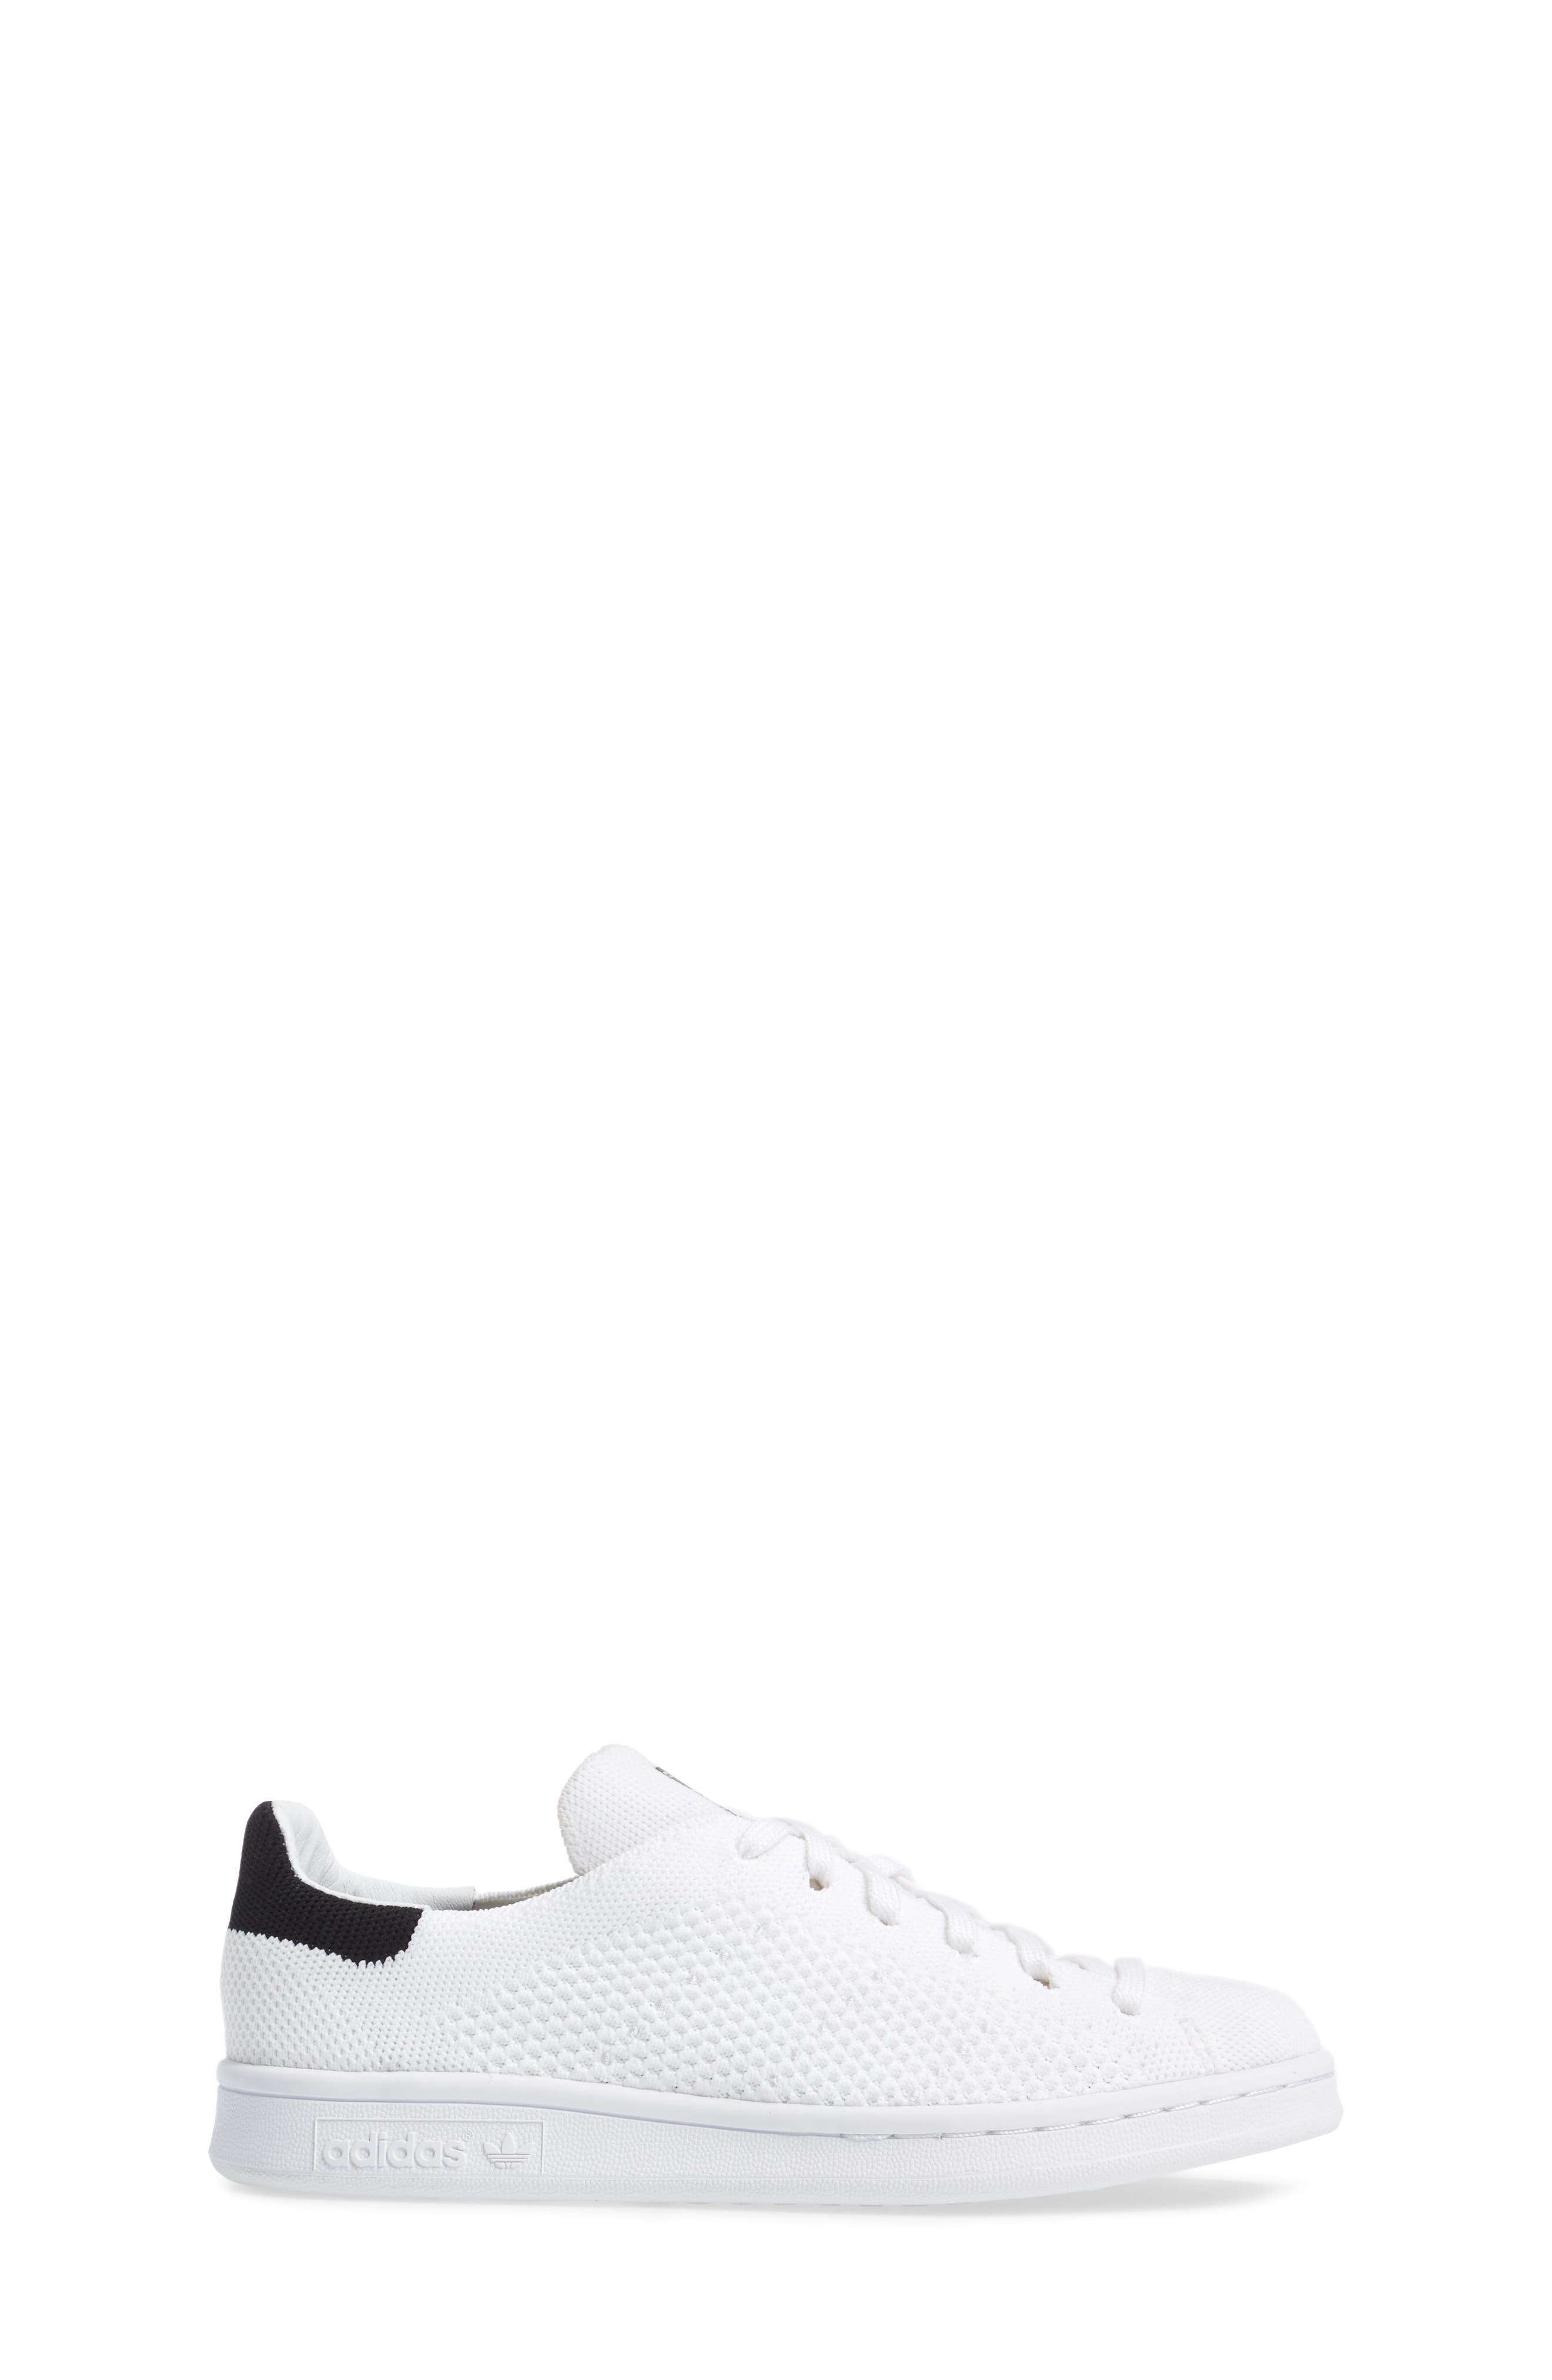 Stan Smith Primeknit Sneaker,                             Alternate thumbnail 3, color,                             100